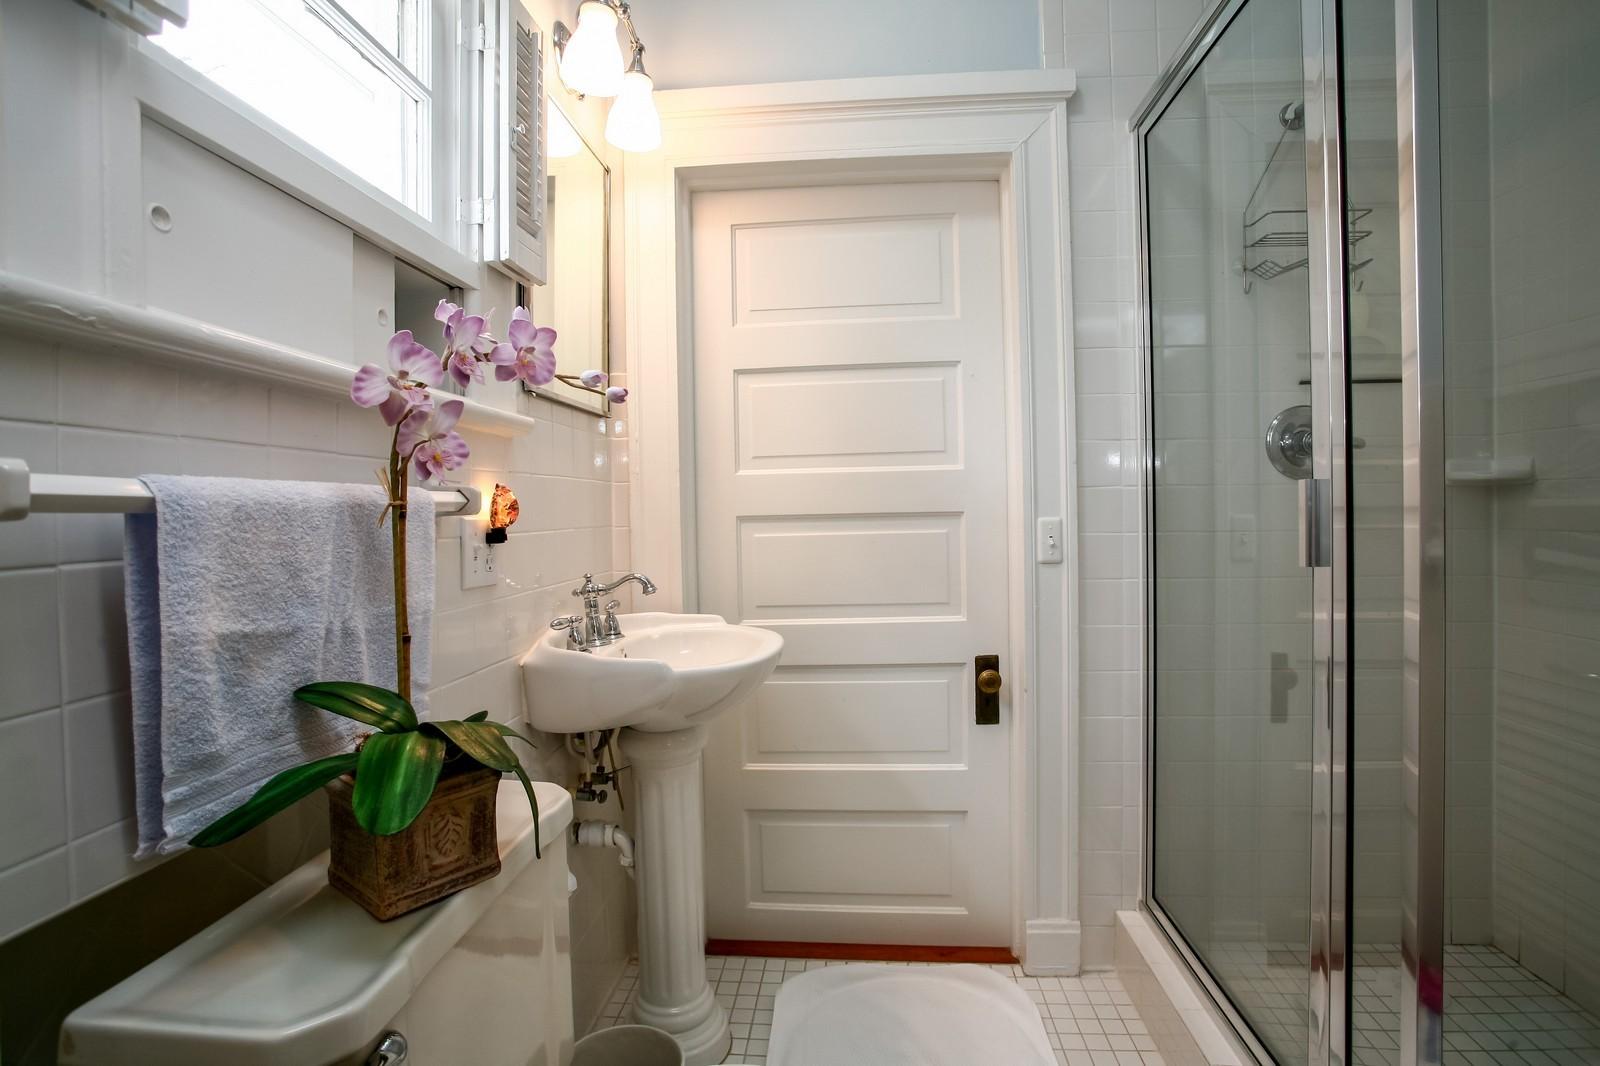 Real Estate Photography - 414 N 14th St, Lanett, AL, 36863 - Bathroom